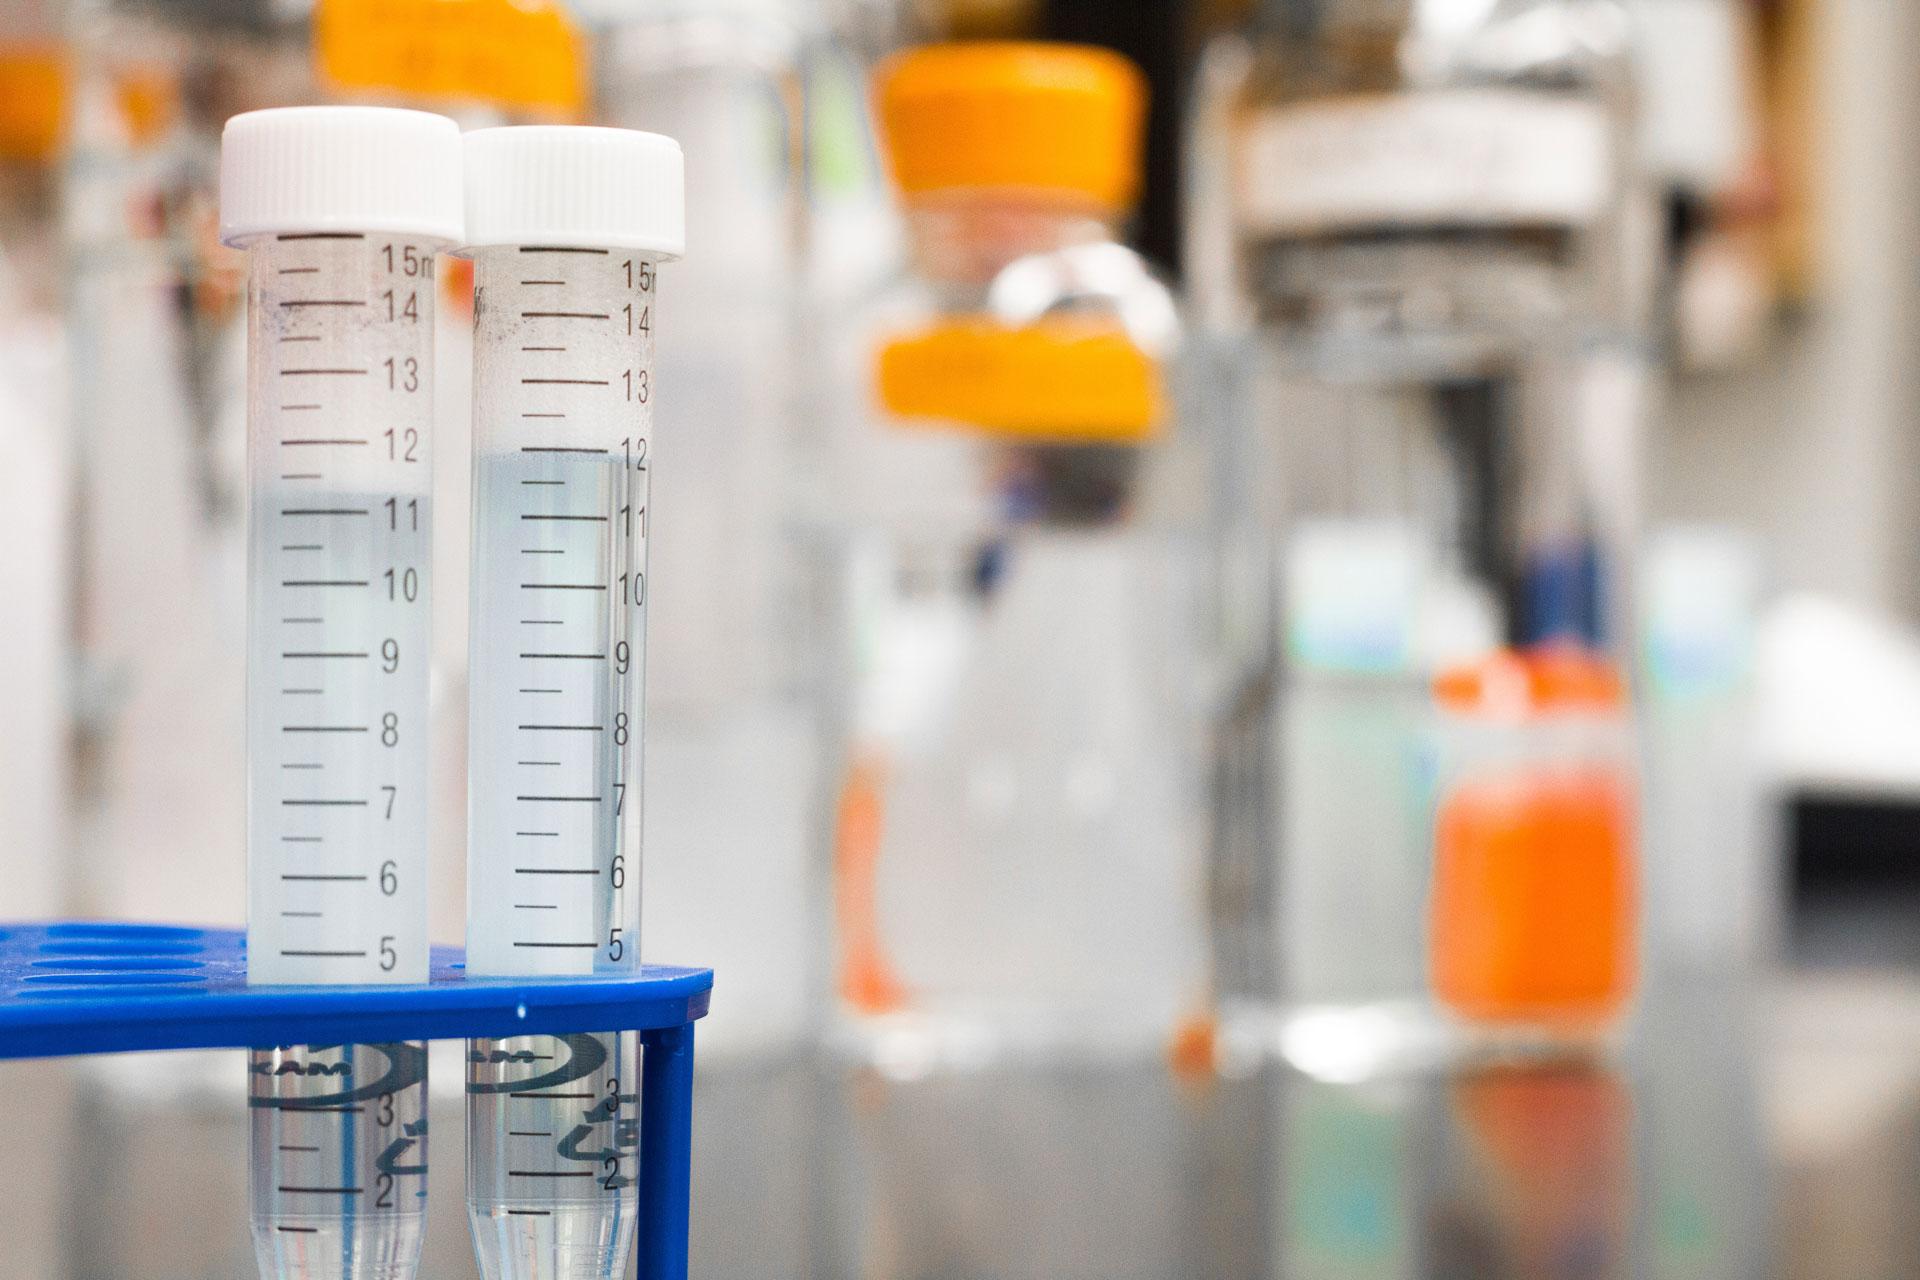 Laboratory tubes and jars